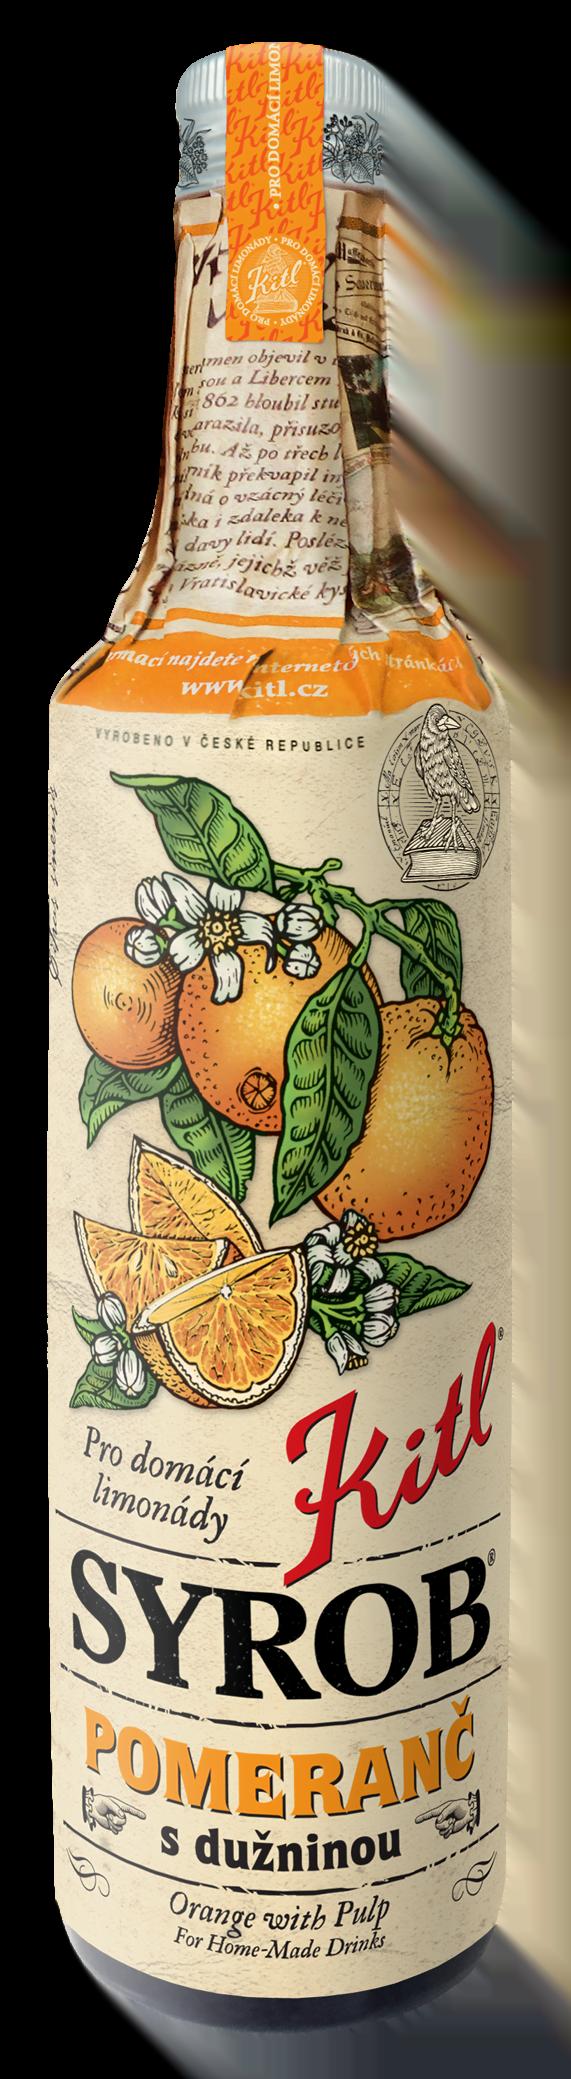 kitl syrob pomeranc 500ml